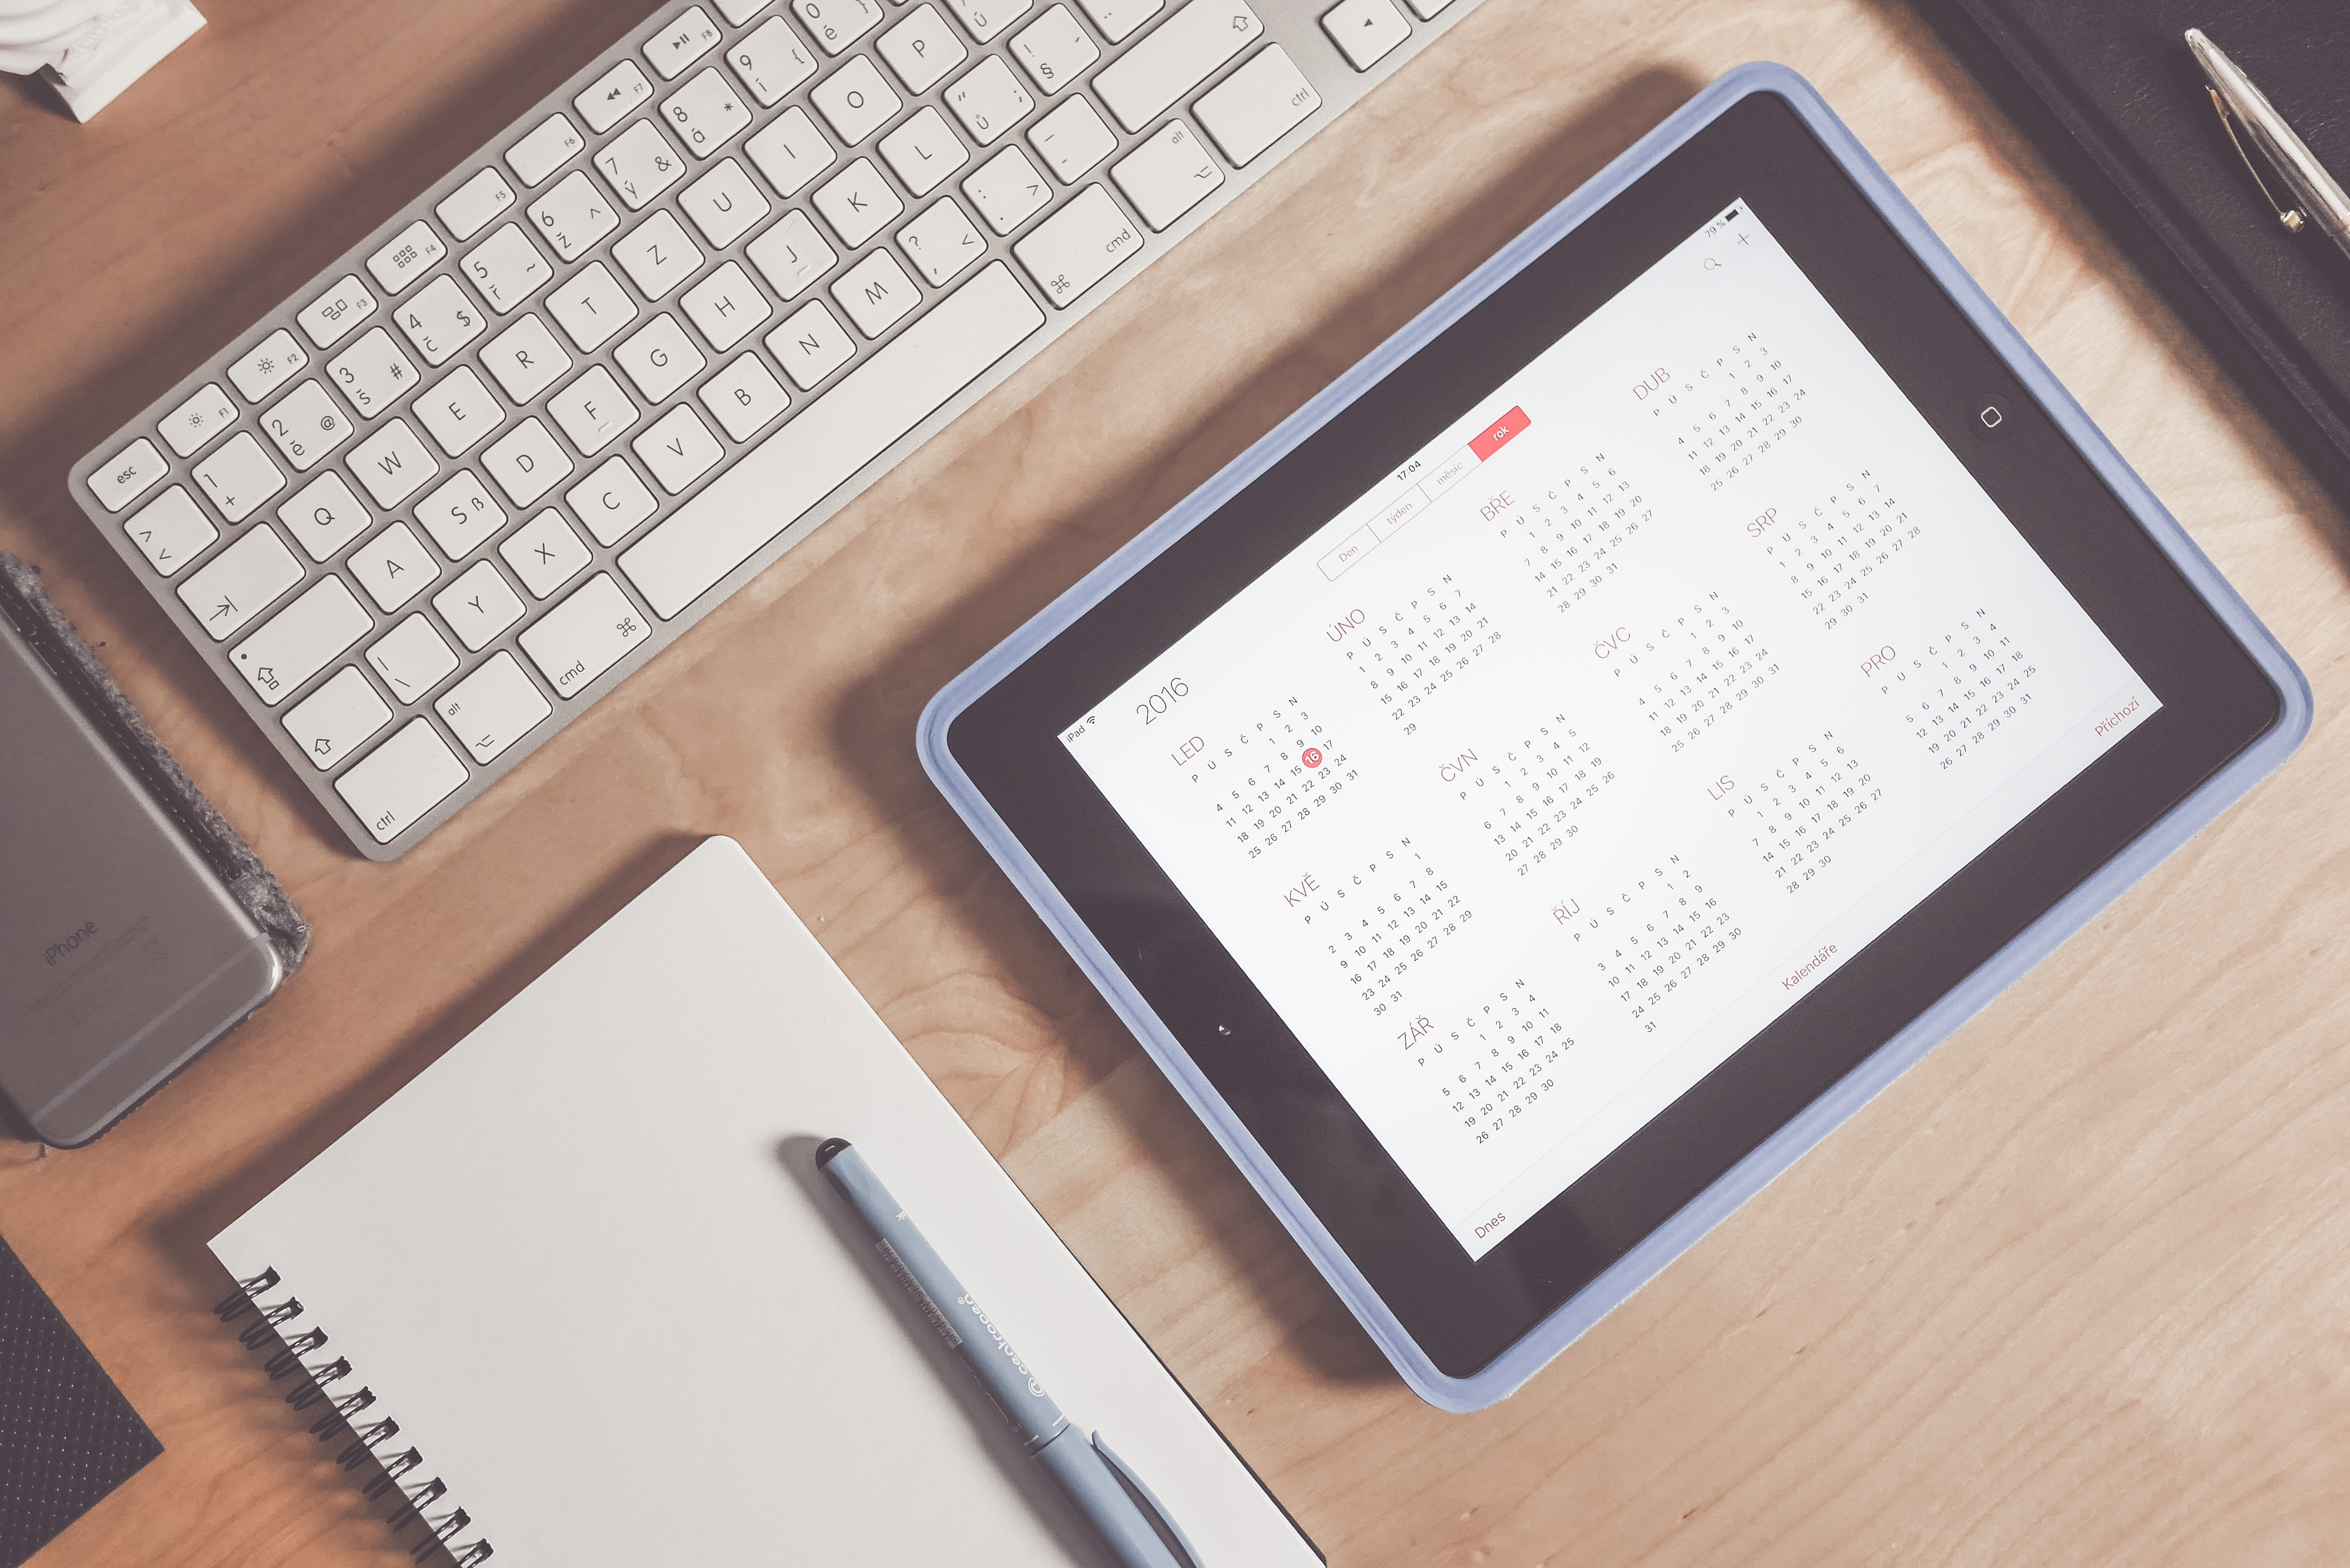 Grey Apple Keyboard and Grey Ipad, Apple, Calendar, Desk, Device, HQ Photo